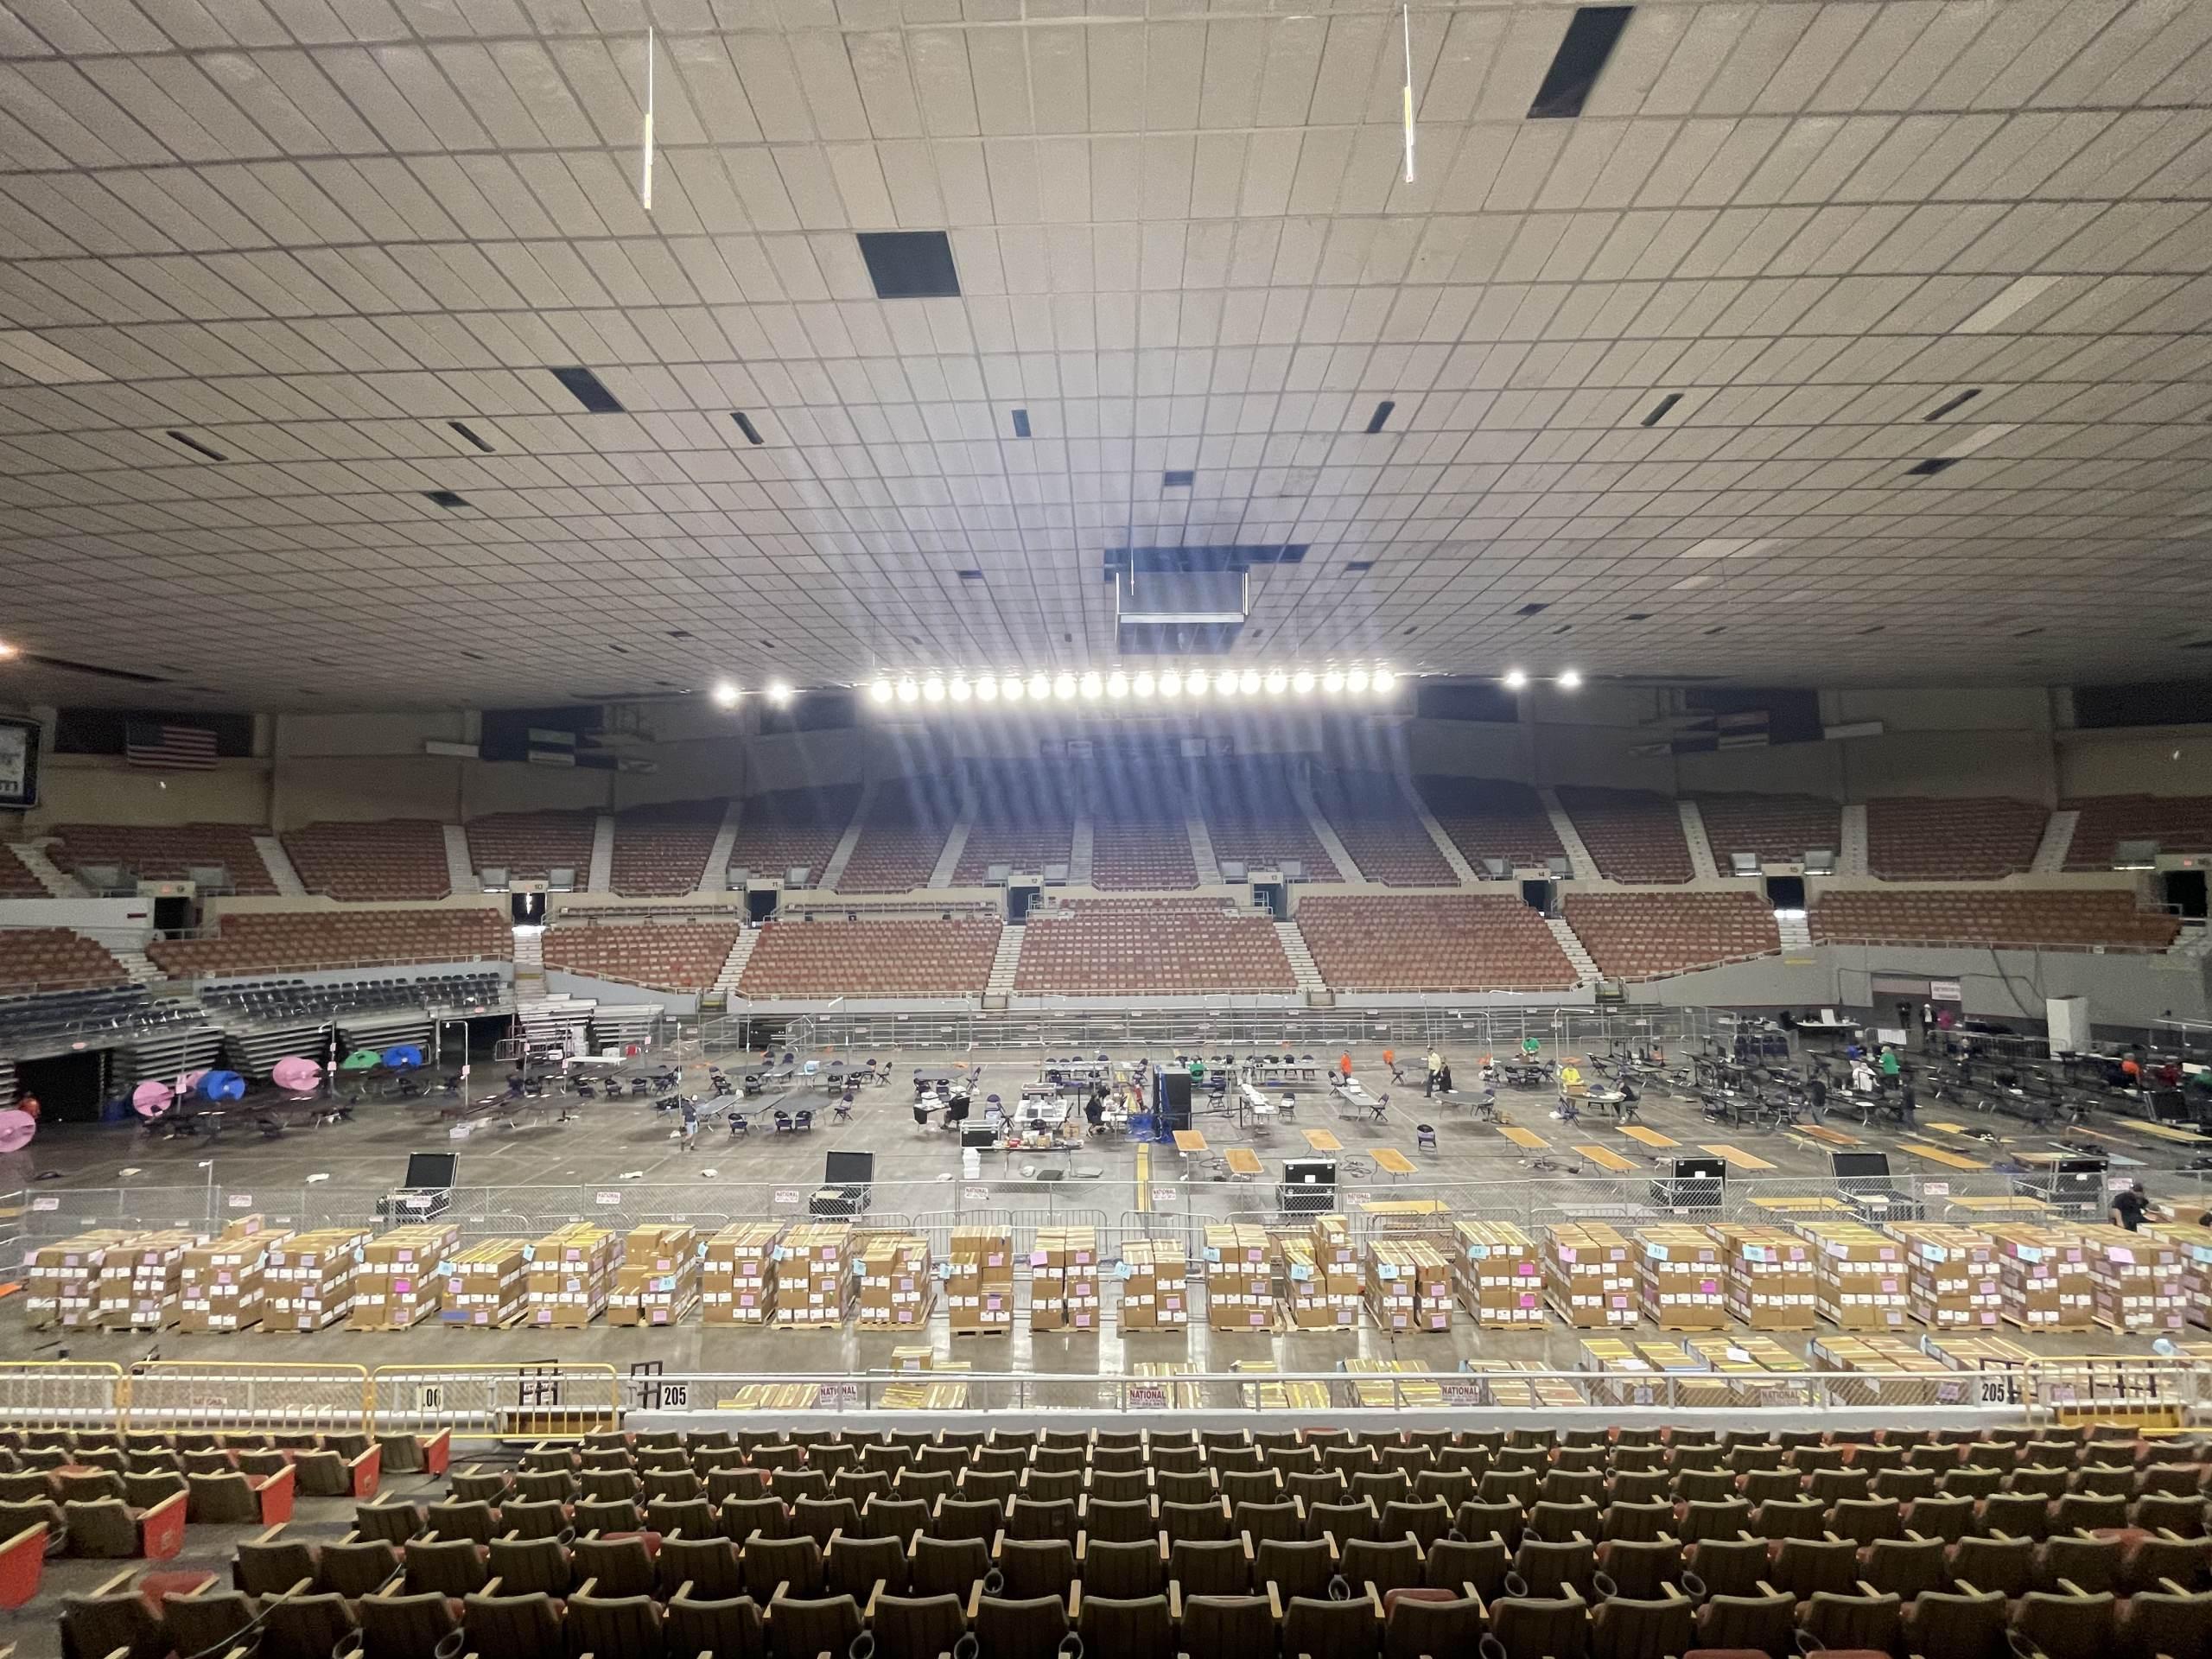 Arizona Audit Vacates Coliseum – Prepares To Return Ballots To Maricopa County WITH Chain Of Custody 1